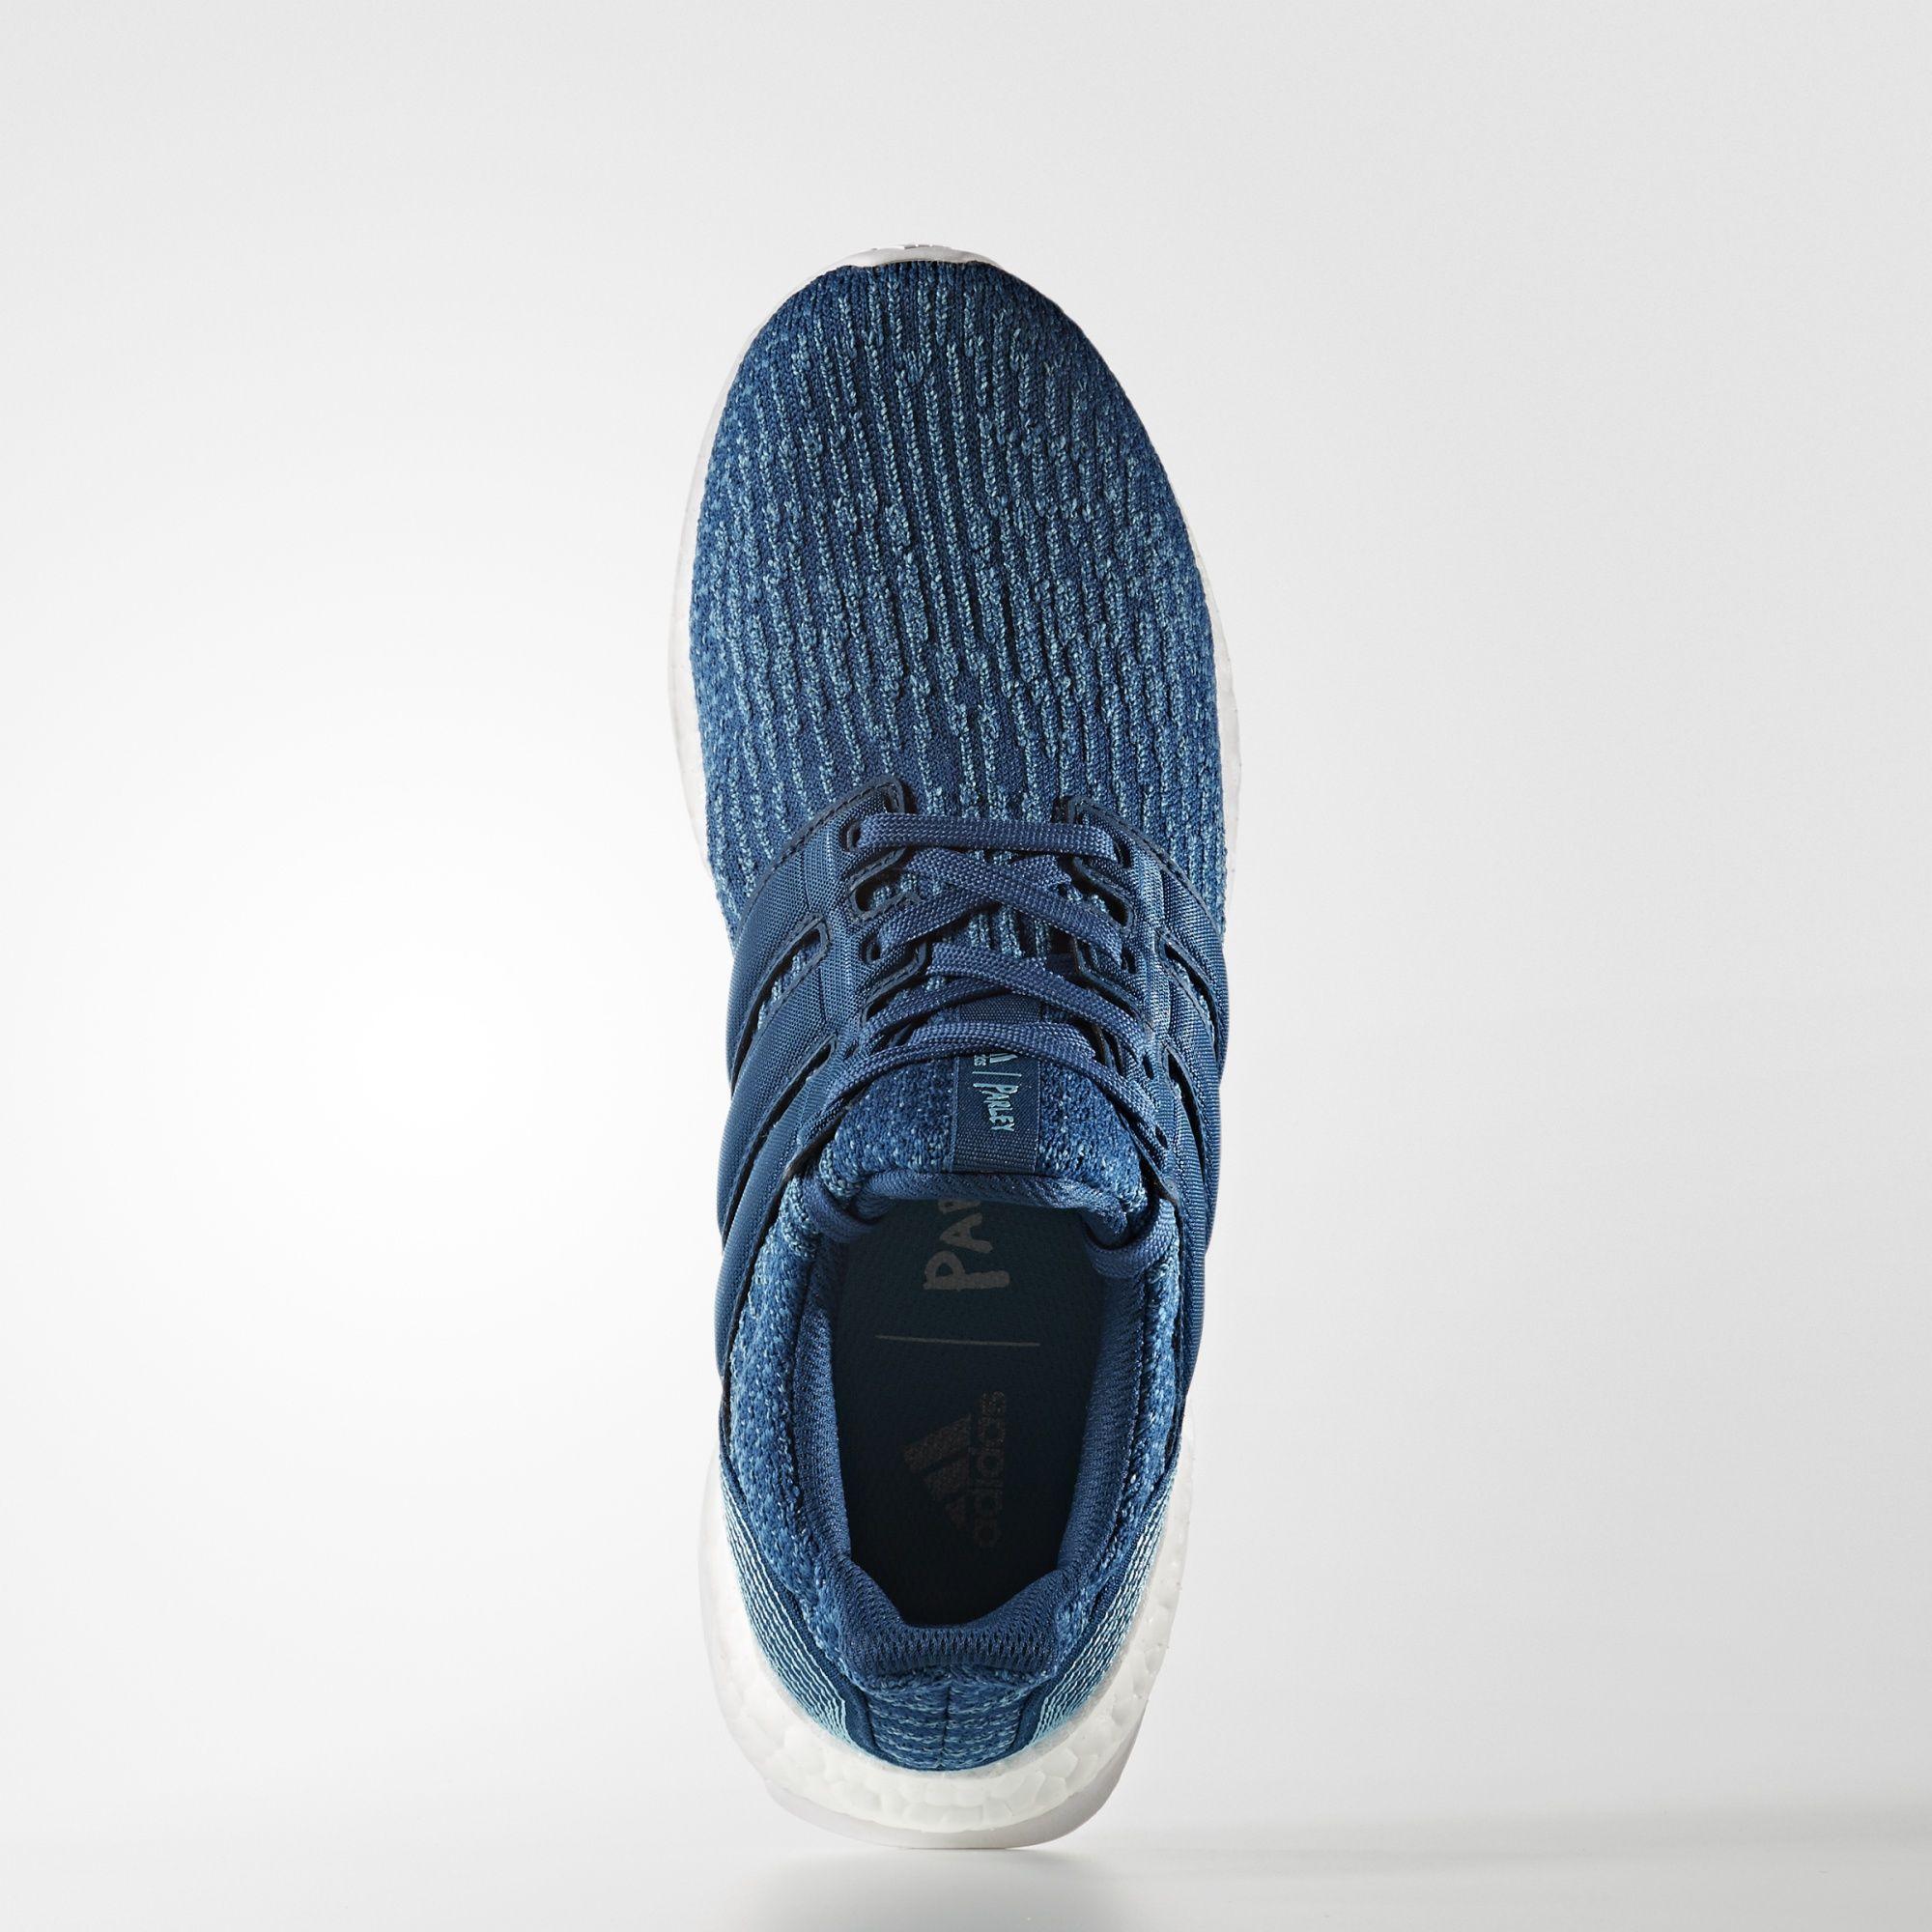 Parley x adidas Ultra Boost Blue Night BB4762 2